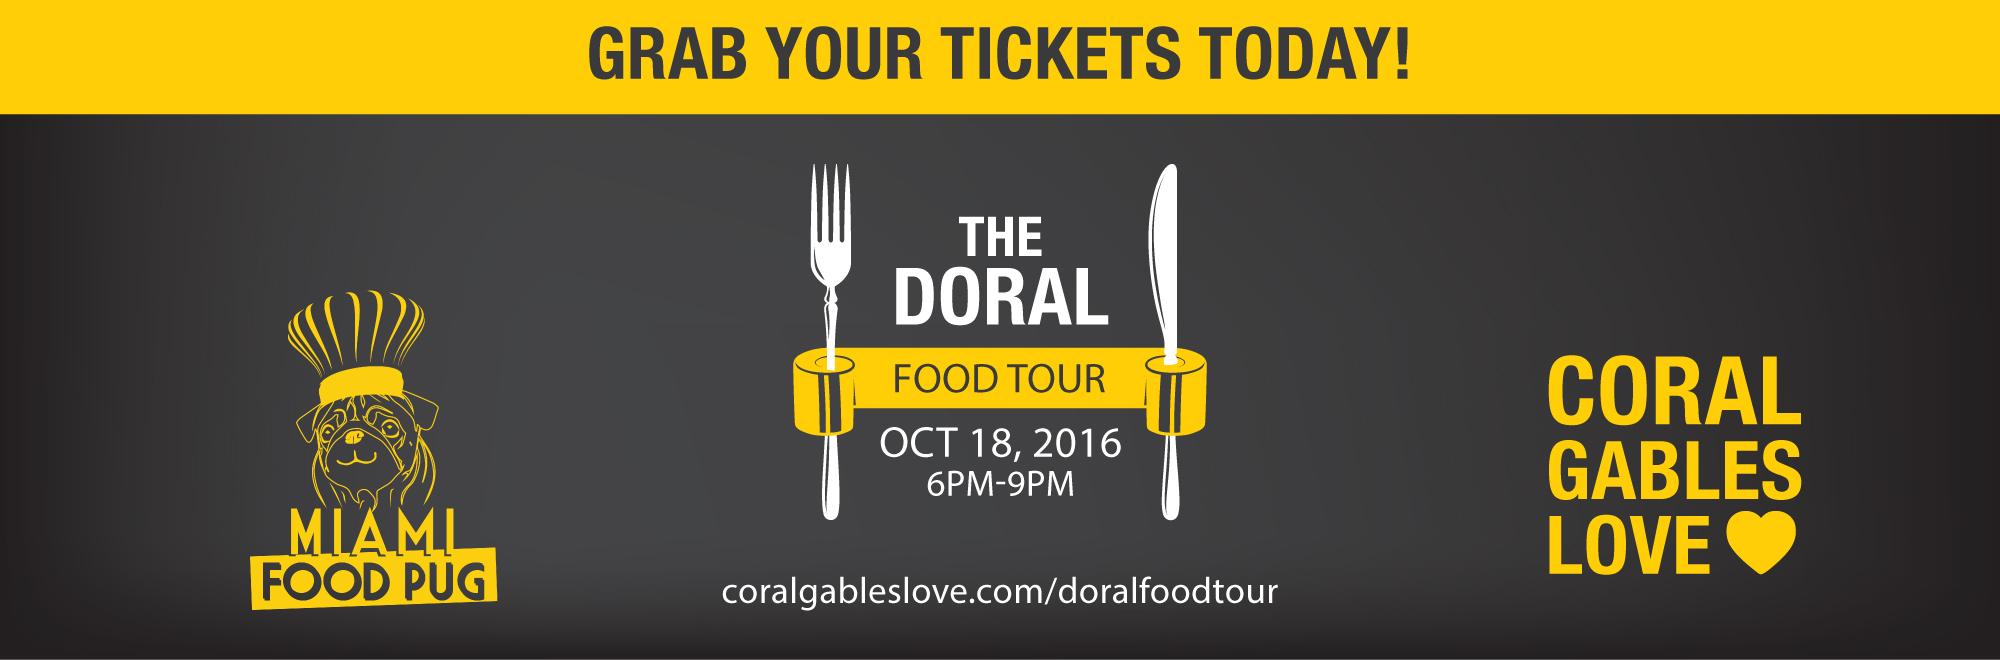 The Doral Food Tour October 2016